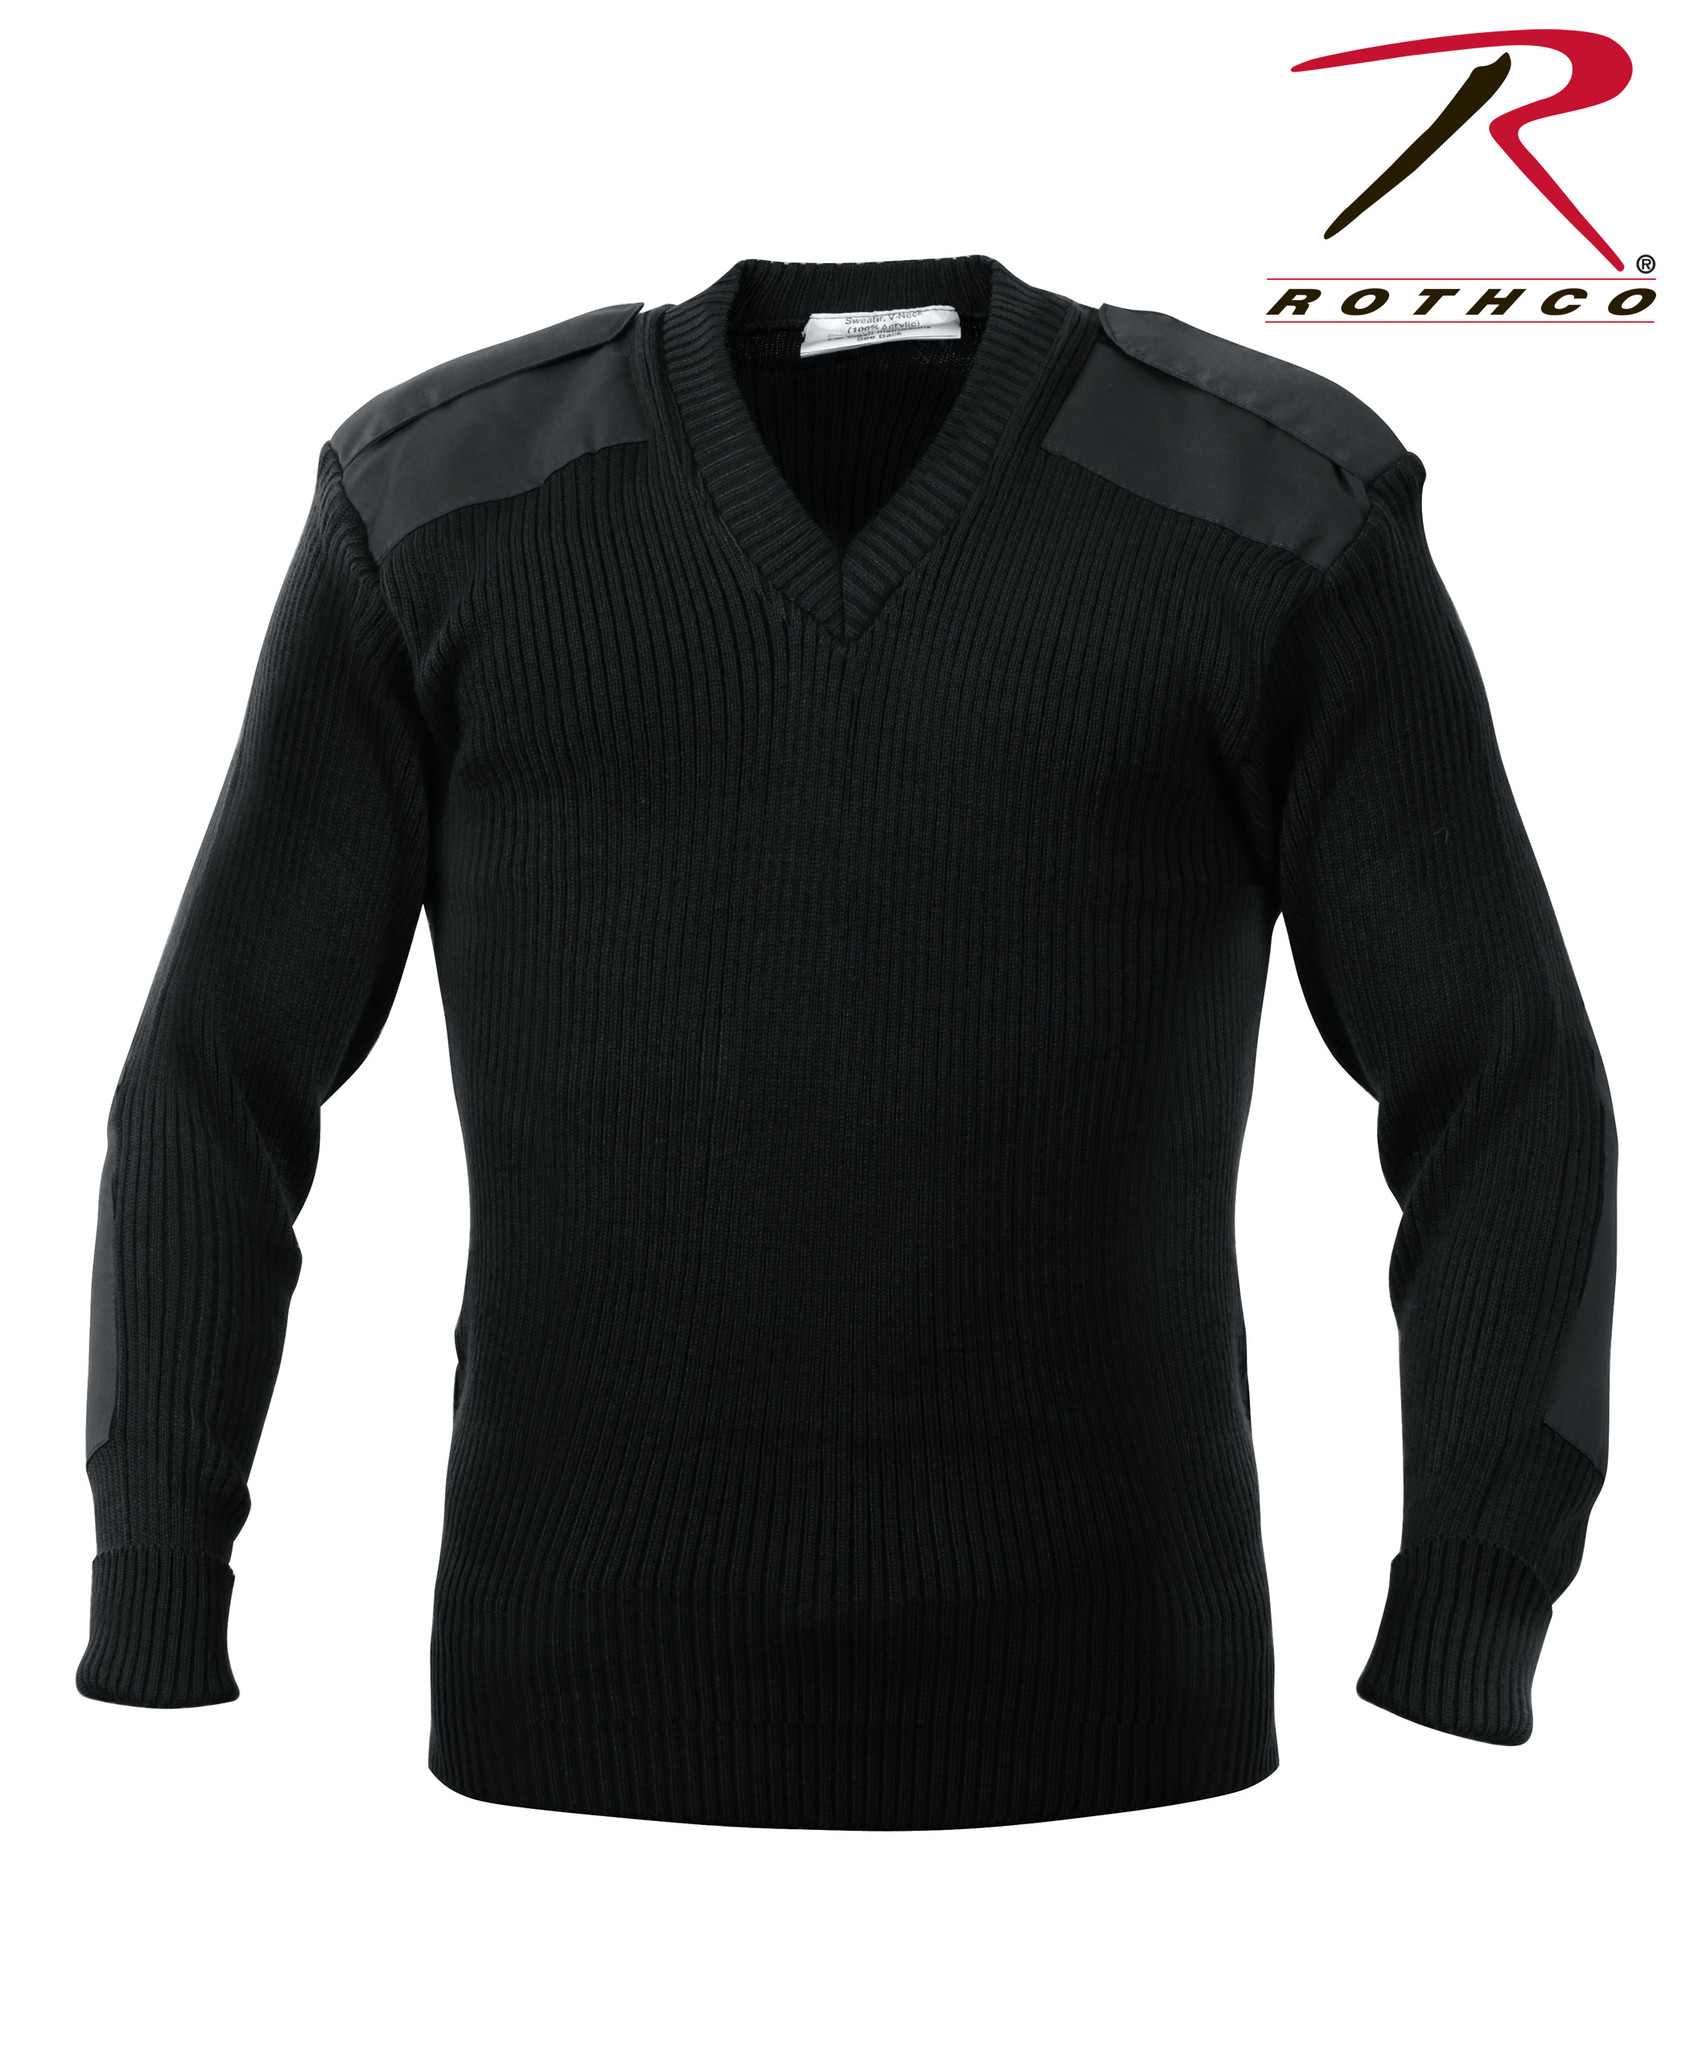 Rothco  GI Style Acrylic V-Neck Sweater